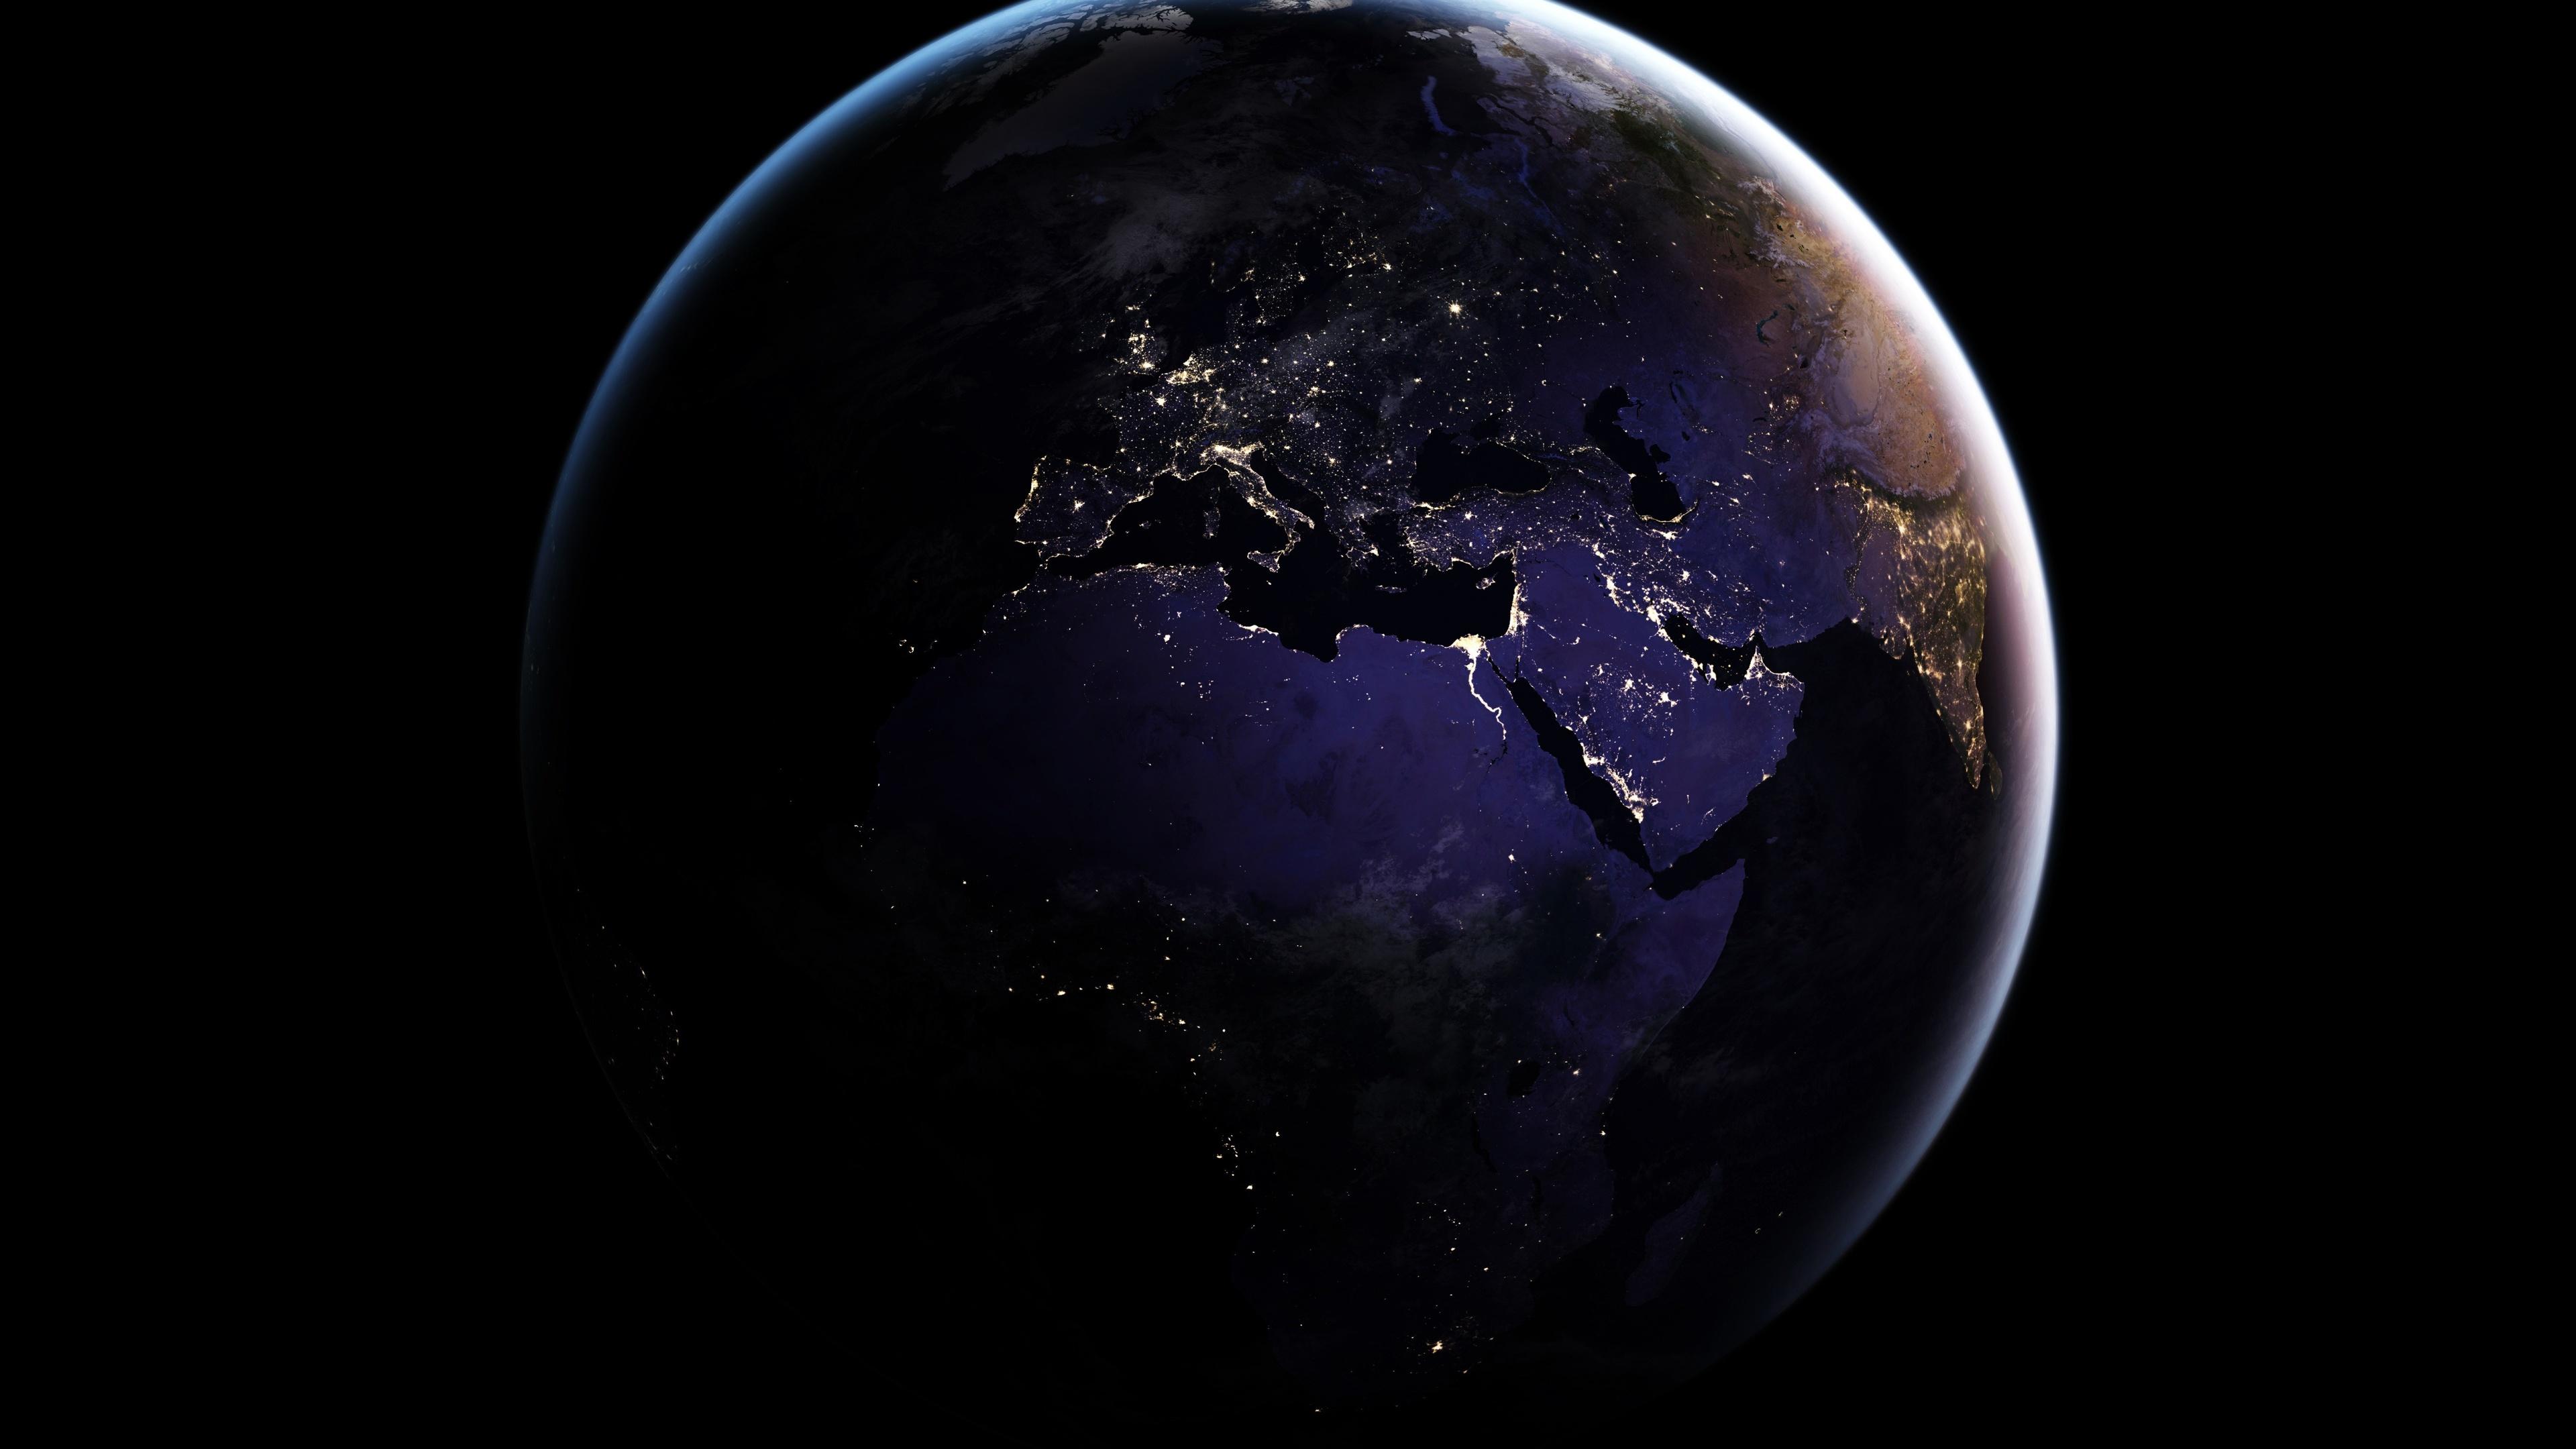 earth 4k digital space art 1546279118 - Earth 4k Digital Space Art - space wallpapers, hd-wallpapers, earth wallpapers, digital universe wallpapers, 5k wallpapers, 4k-wallpapers